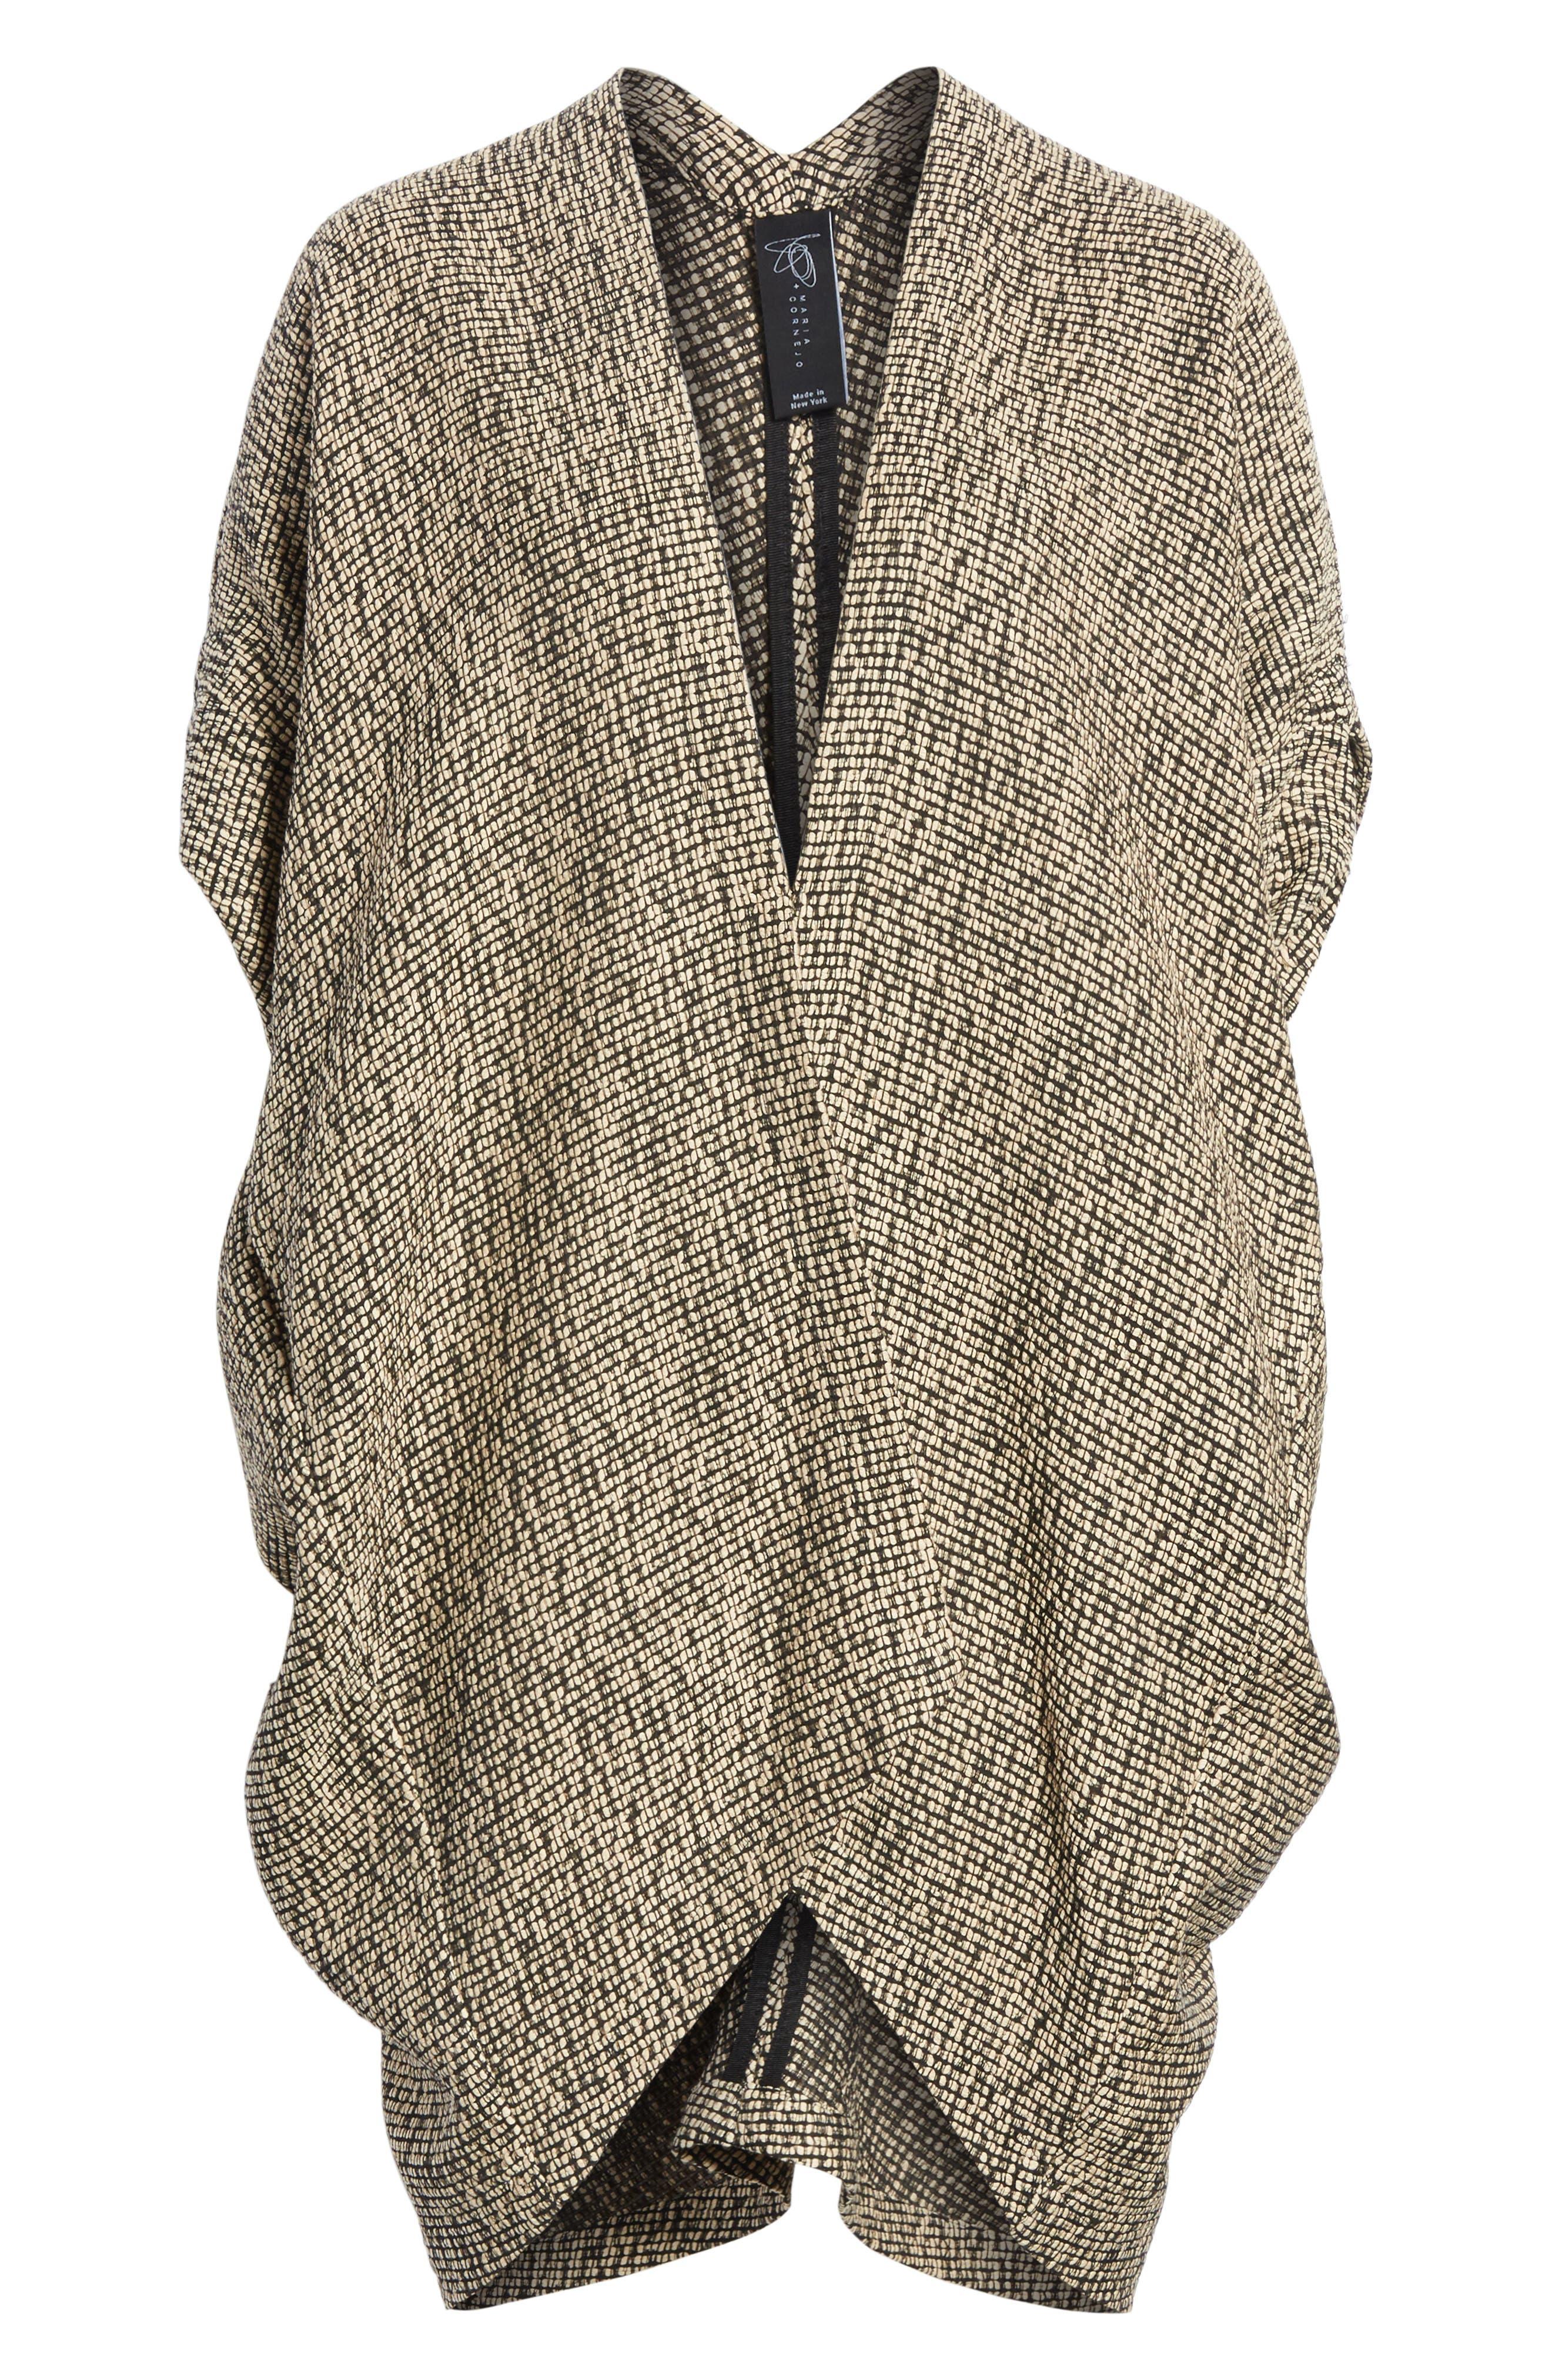 Open Weave Sweater,                             Alternate thumbnail 6, color,                             Black/Greige